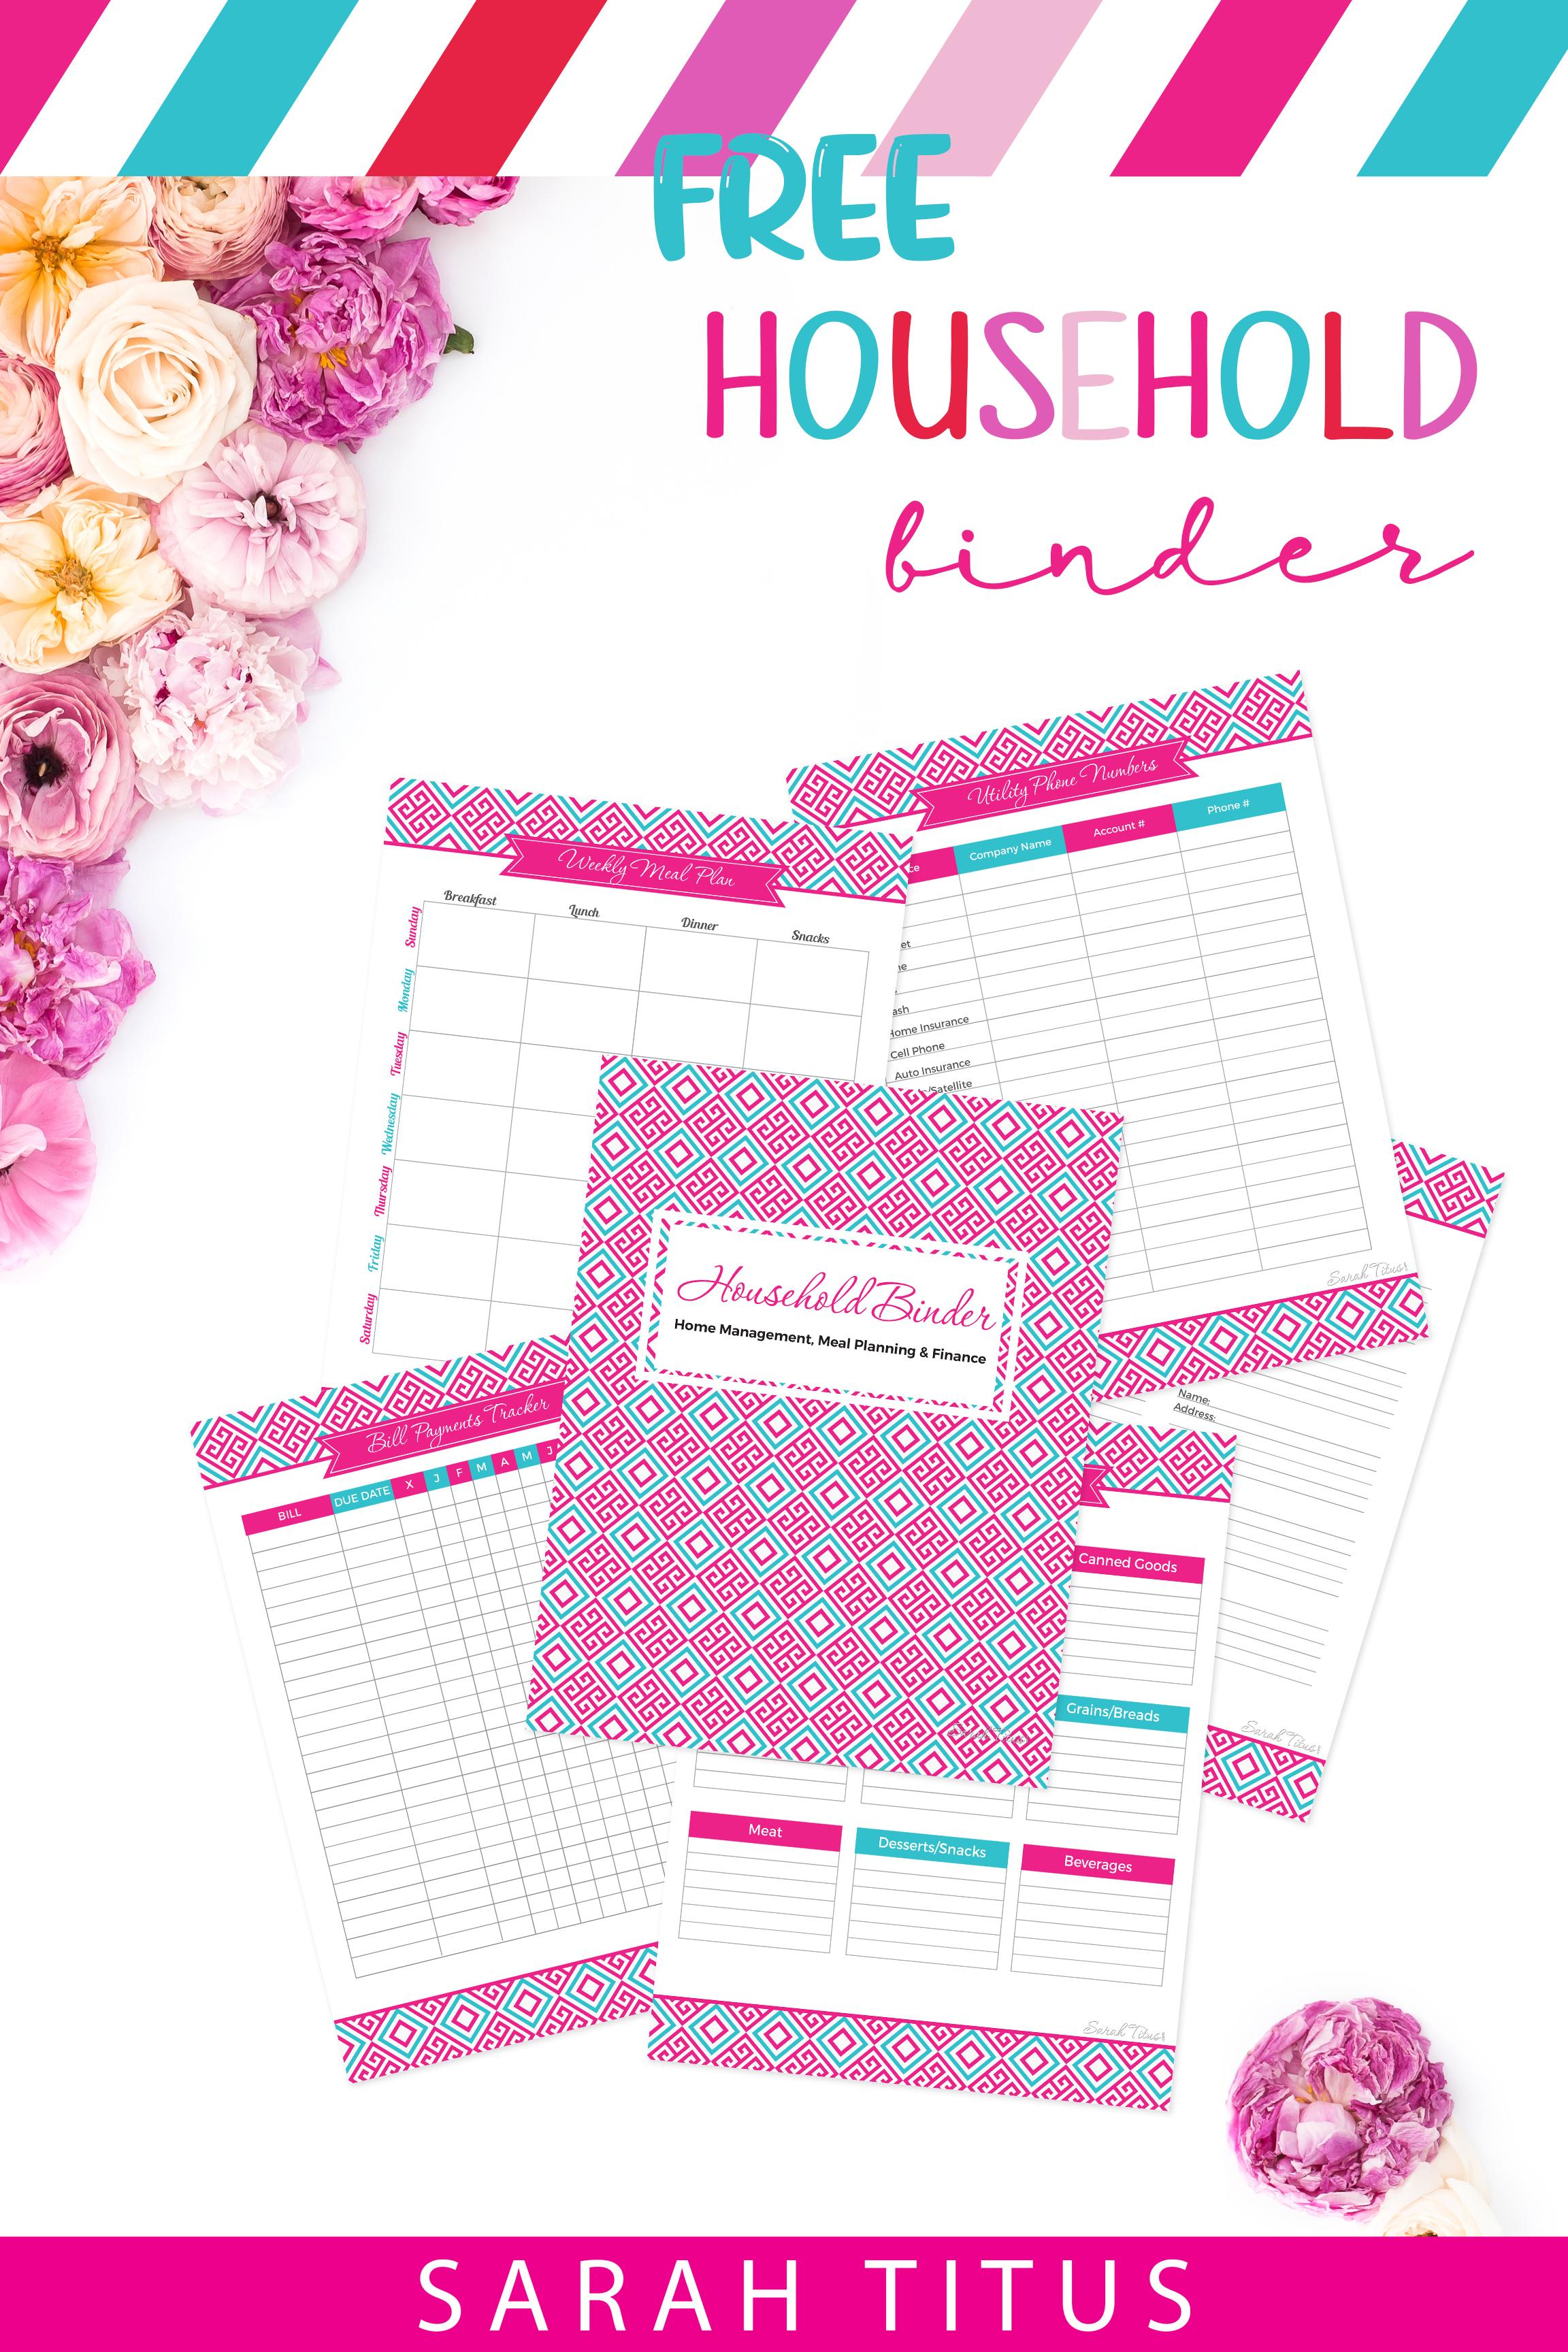 Household Binder Free Printables - Sarah Titus - Free Printable Household Binder